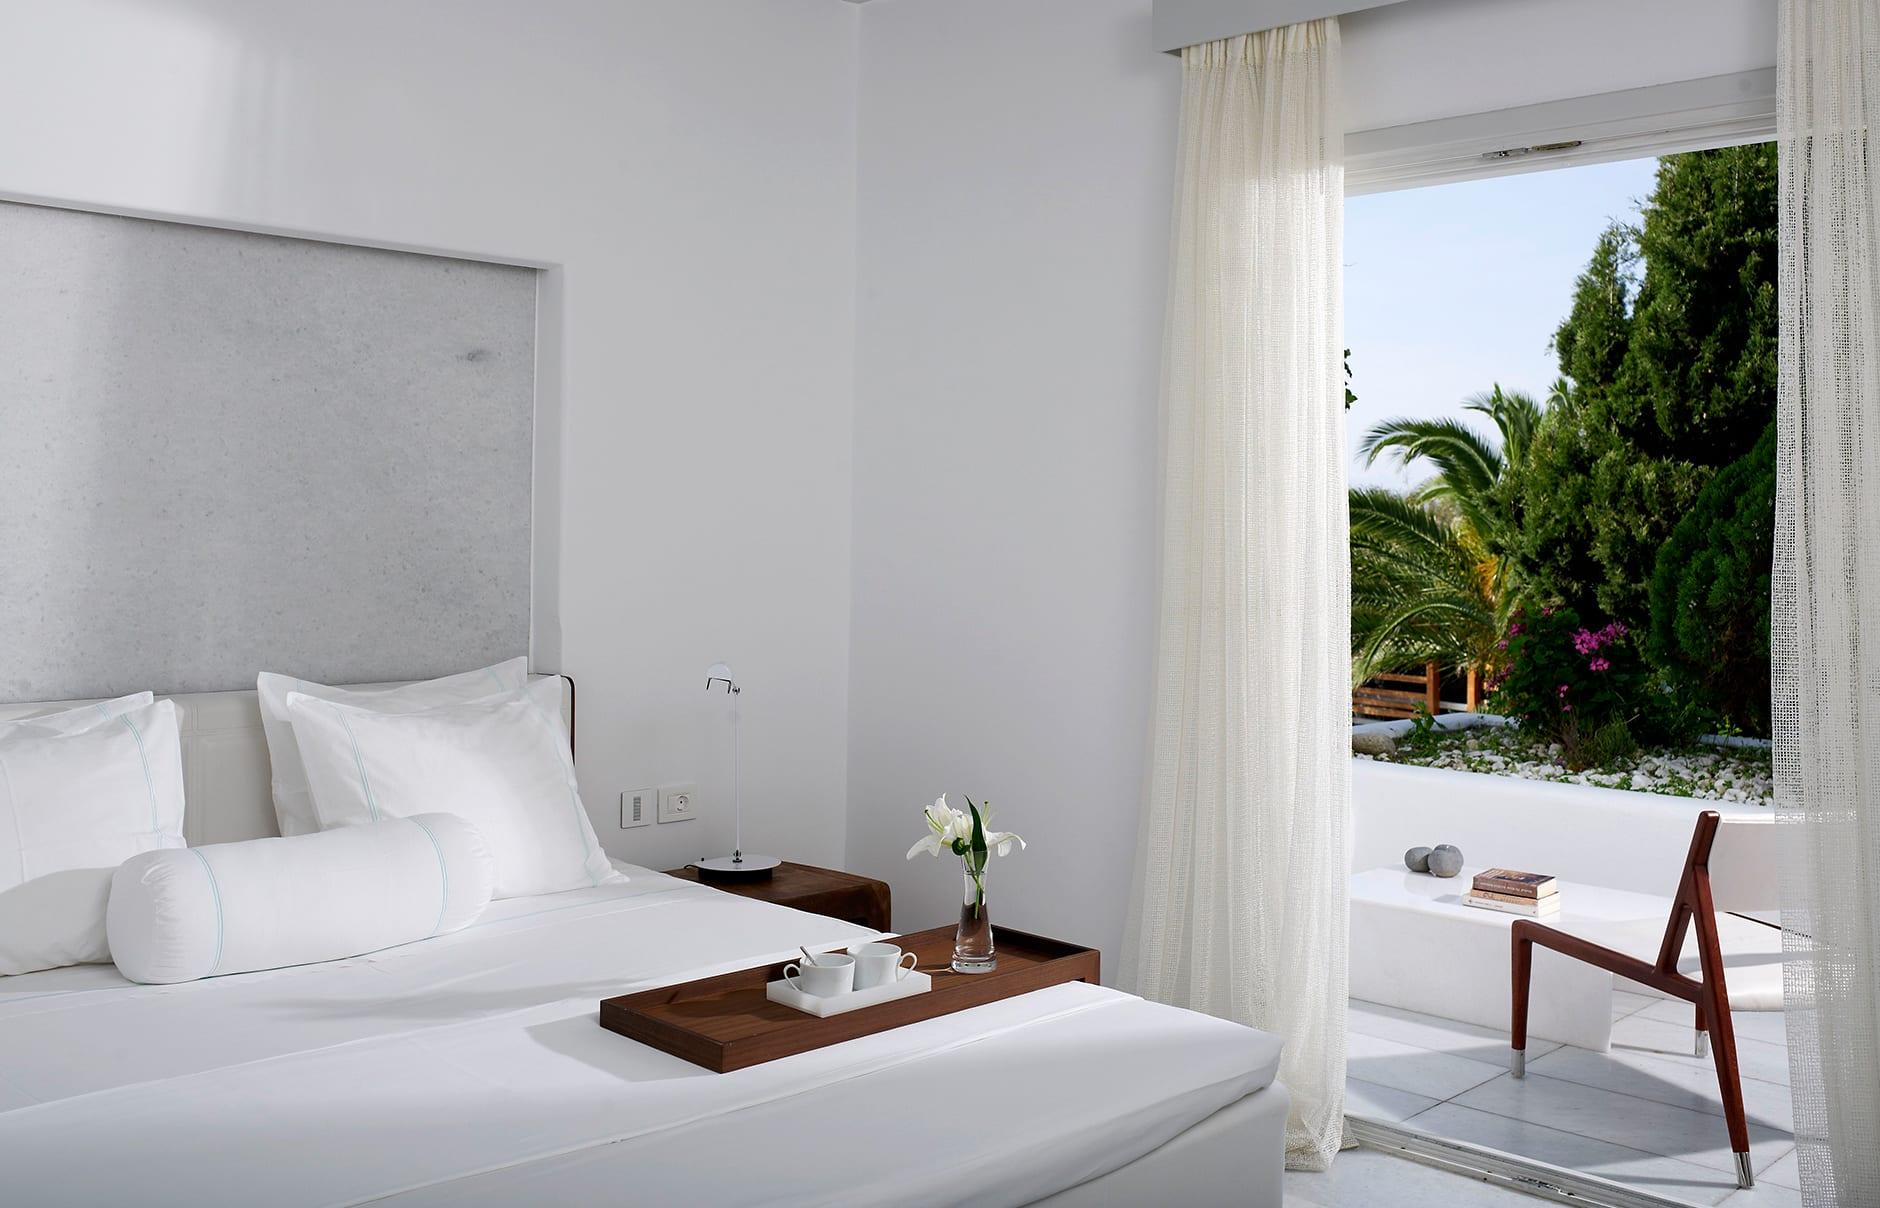 New Standard Room. Belvedere Mykonos, Greece. © Belvedere Mykonos